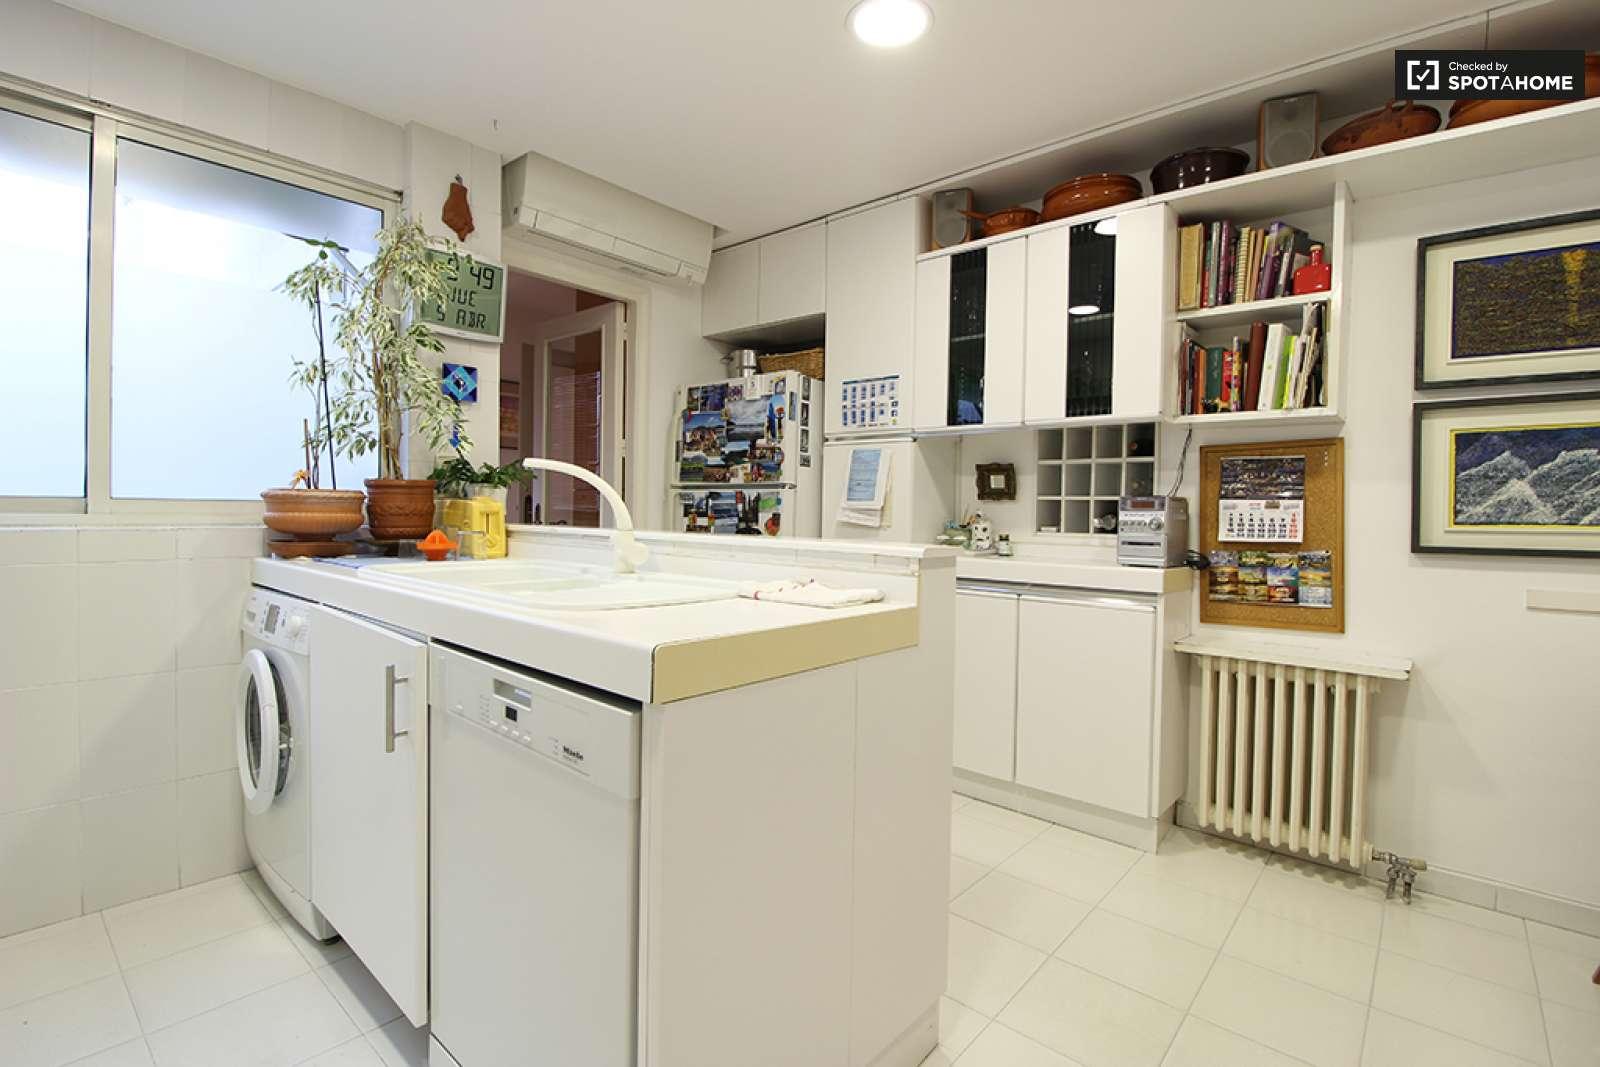 Cozy room in 3-bedroom apartment in Hortaleza, Madrid (ref: 213266 ...